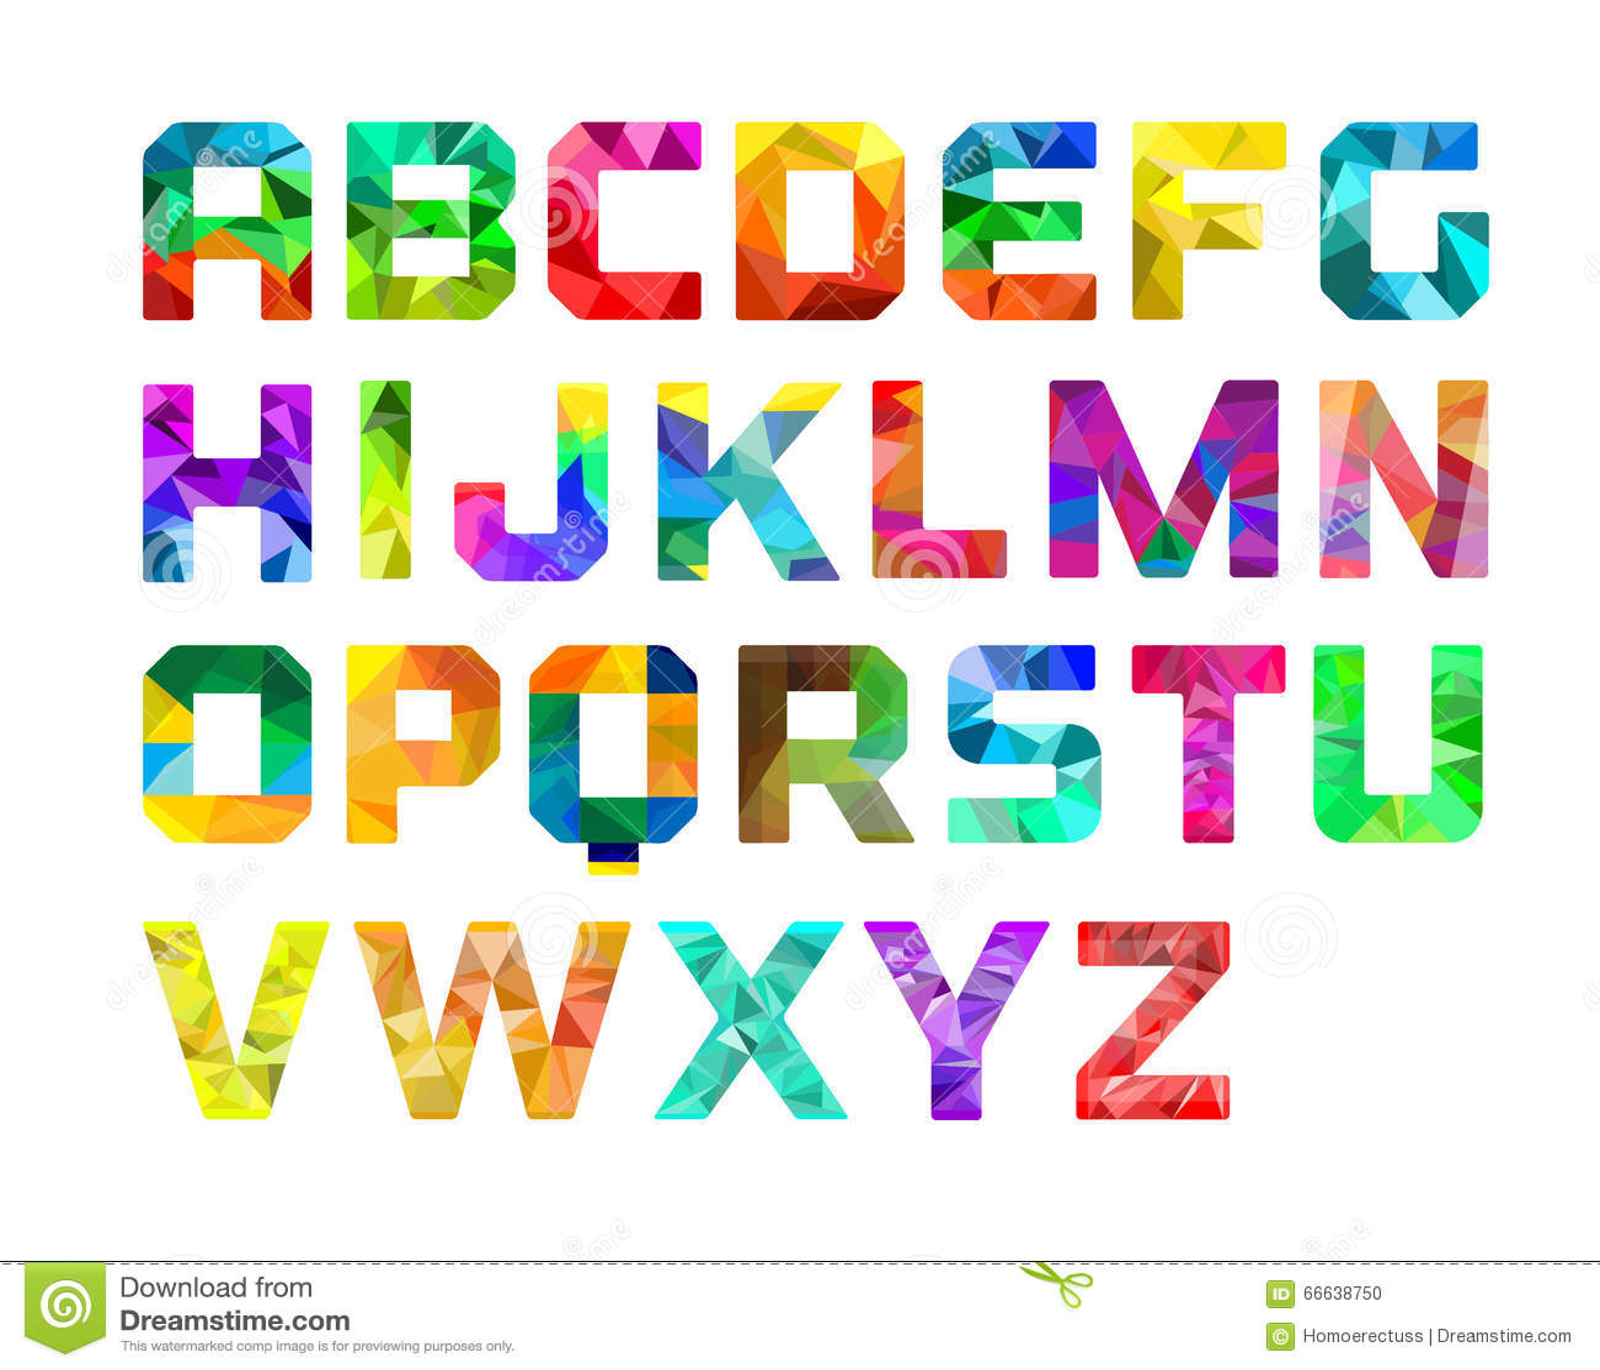 Patterned Letter S In Blue